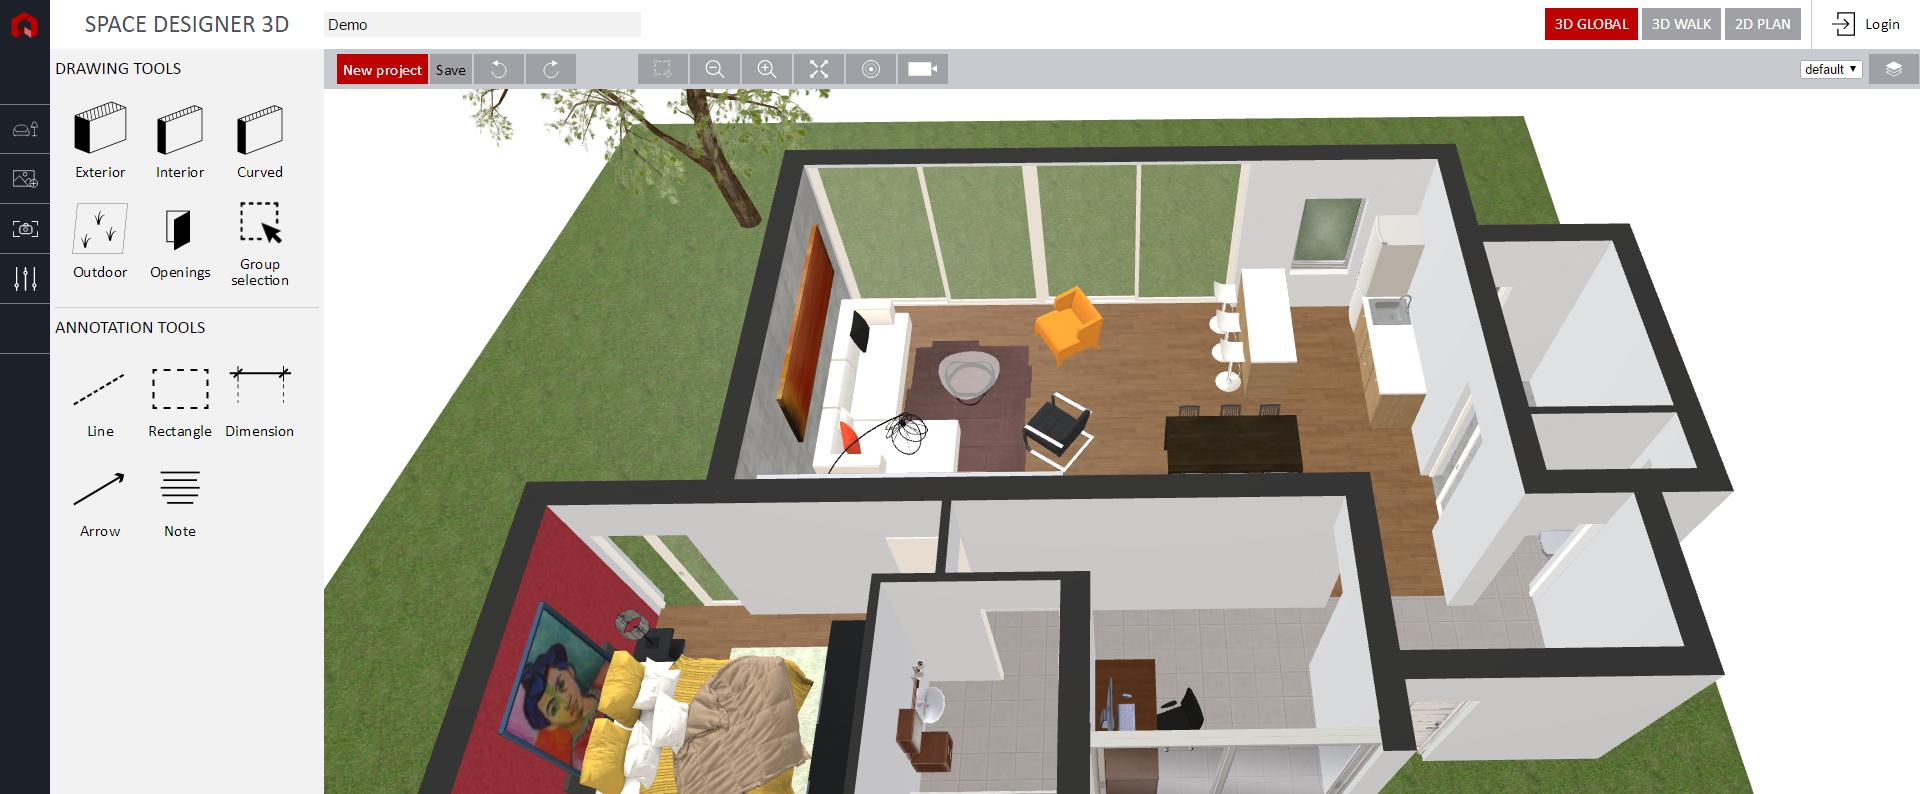 Amazing File:Screenshot Space Designer 3D.png